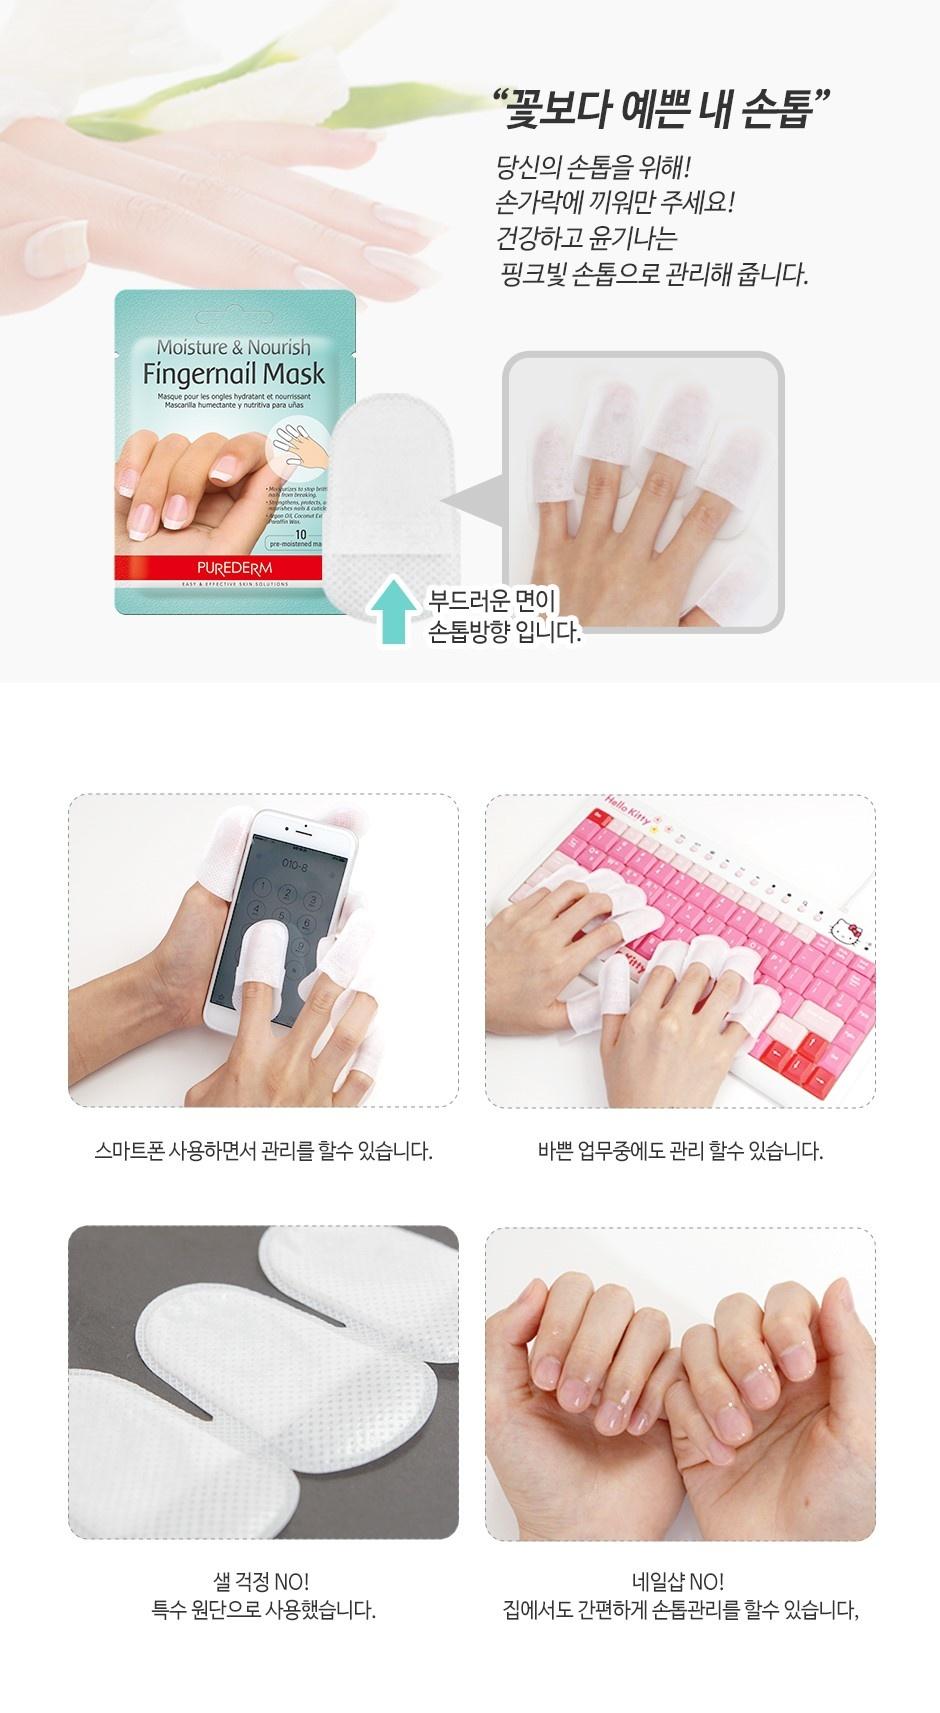 Moisture & Nourish Fingernail Mask-3